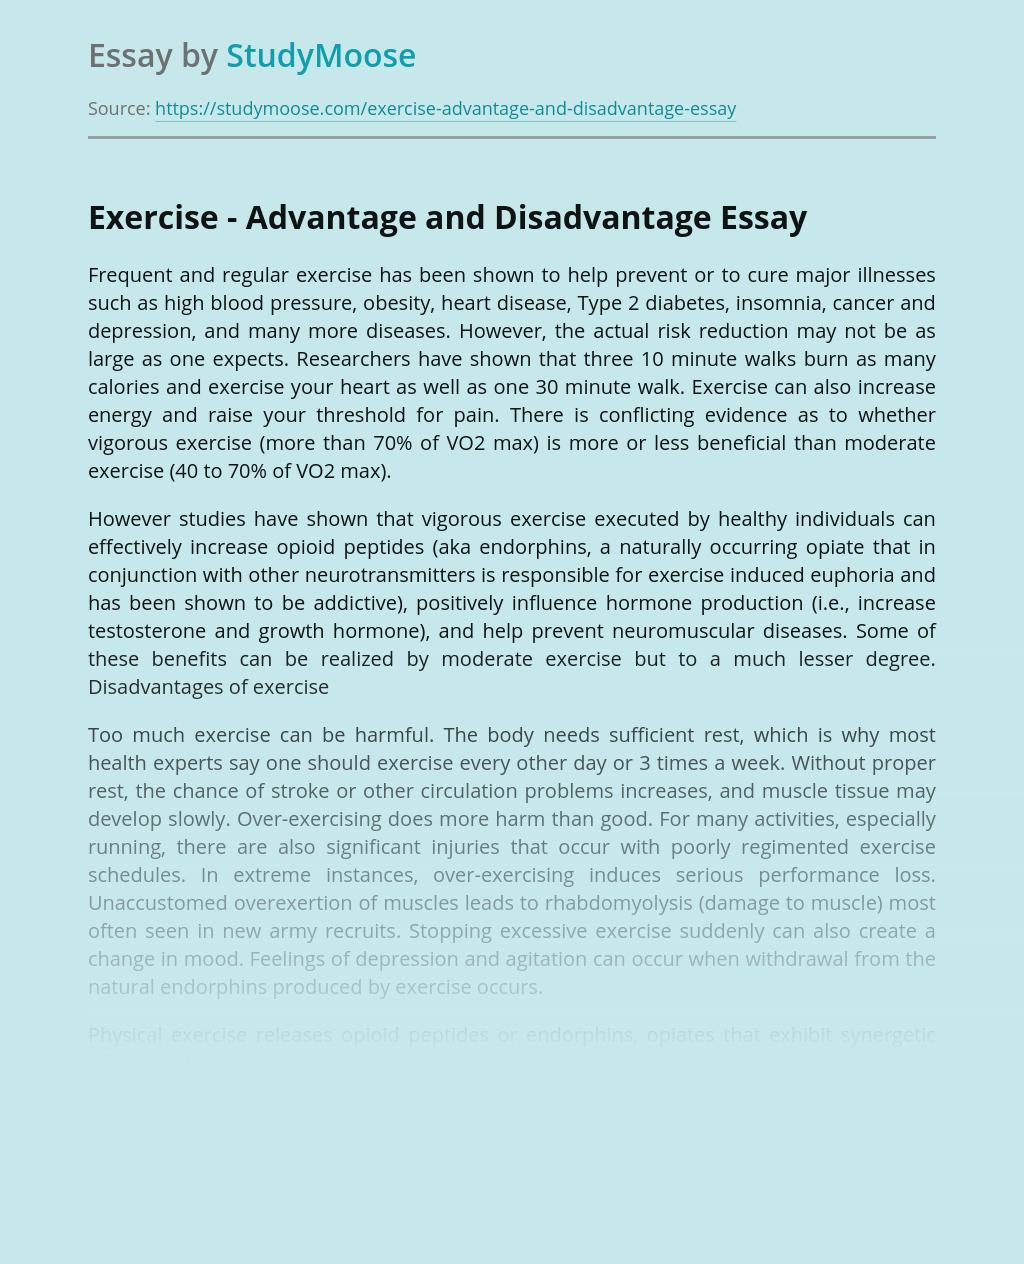 Exercise - Advantage and Disadvantage